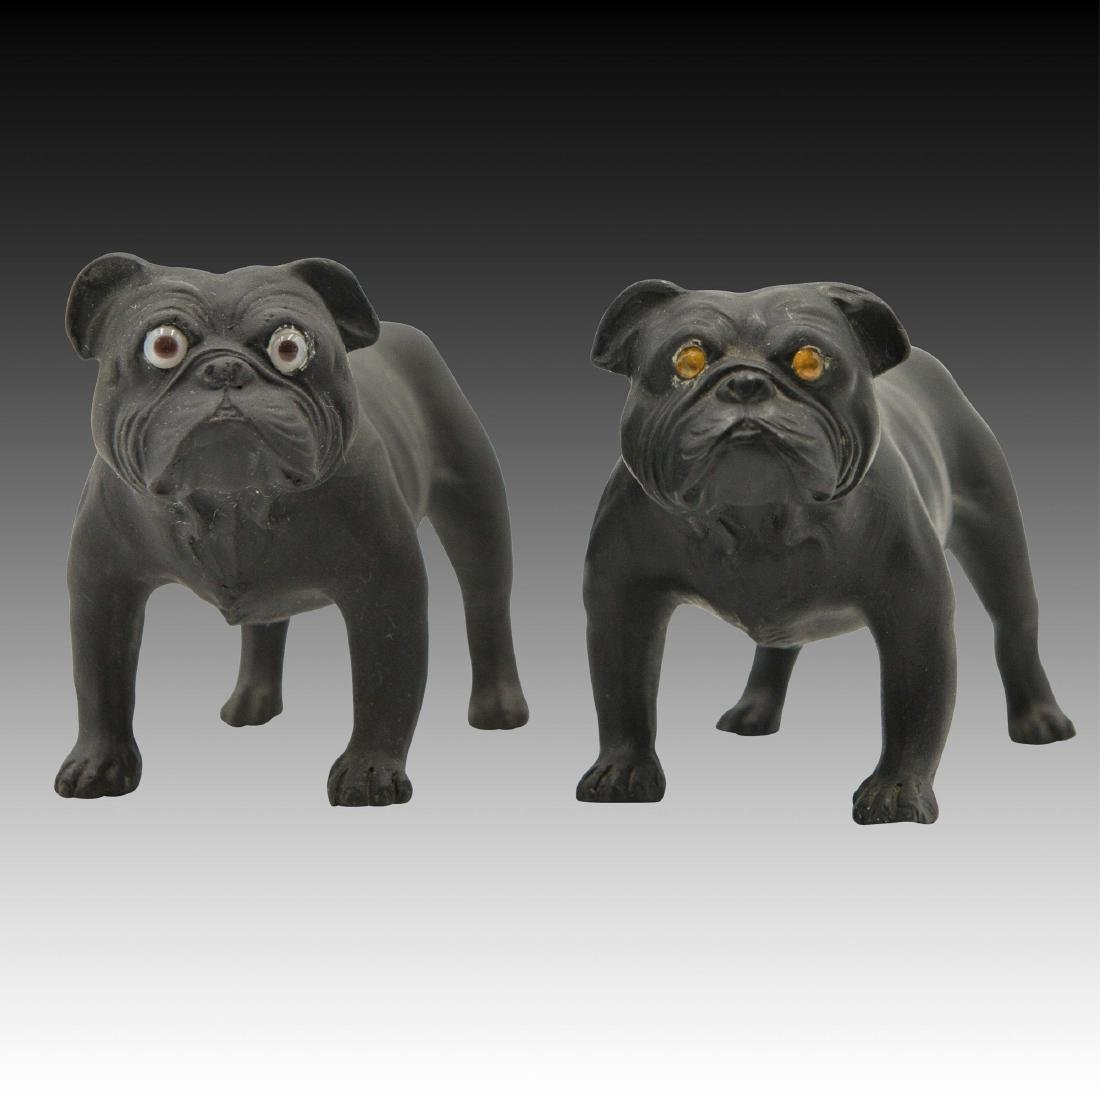 2 Wedgwood Basalt  Bulldogs by Ernest Light